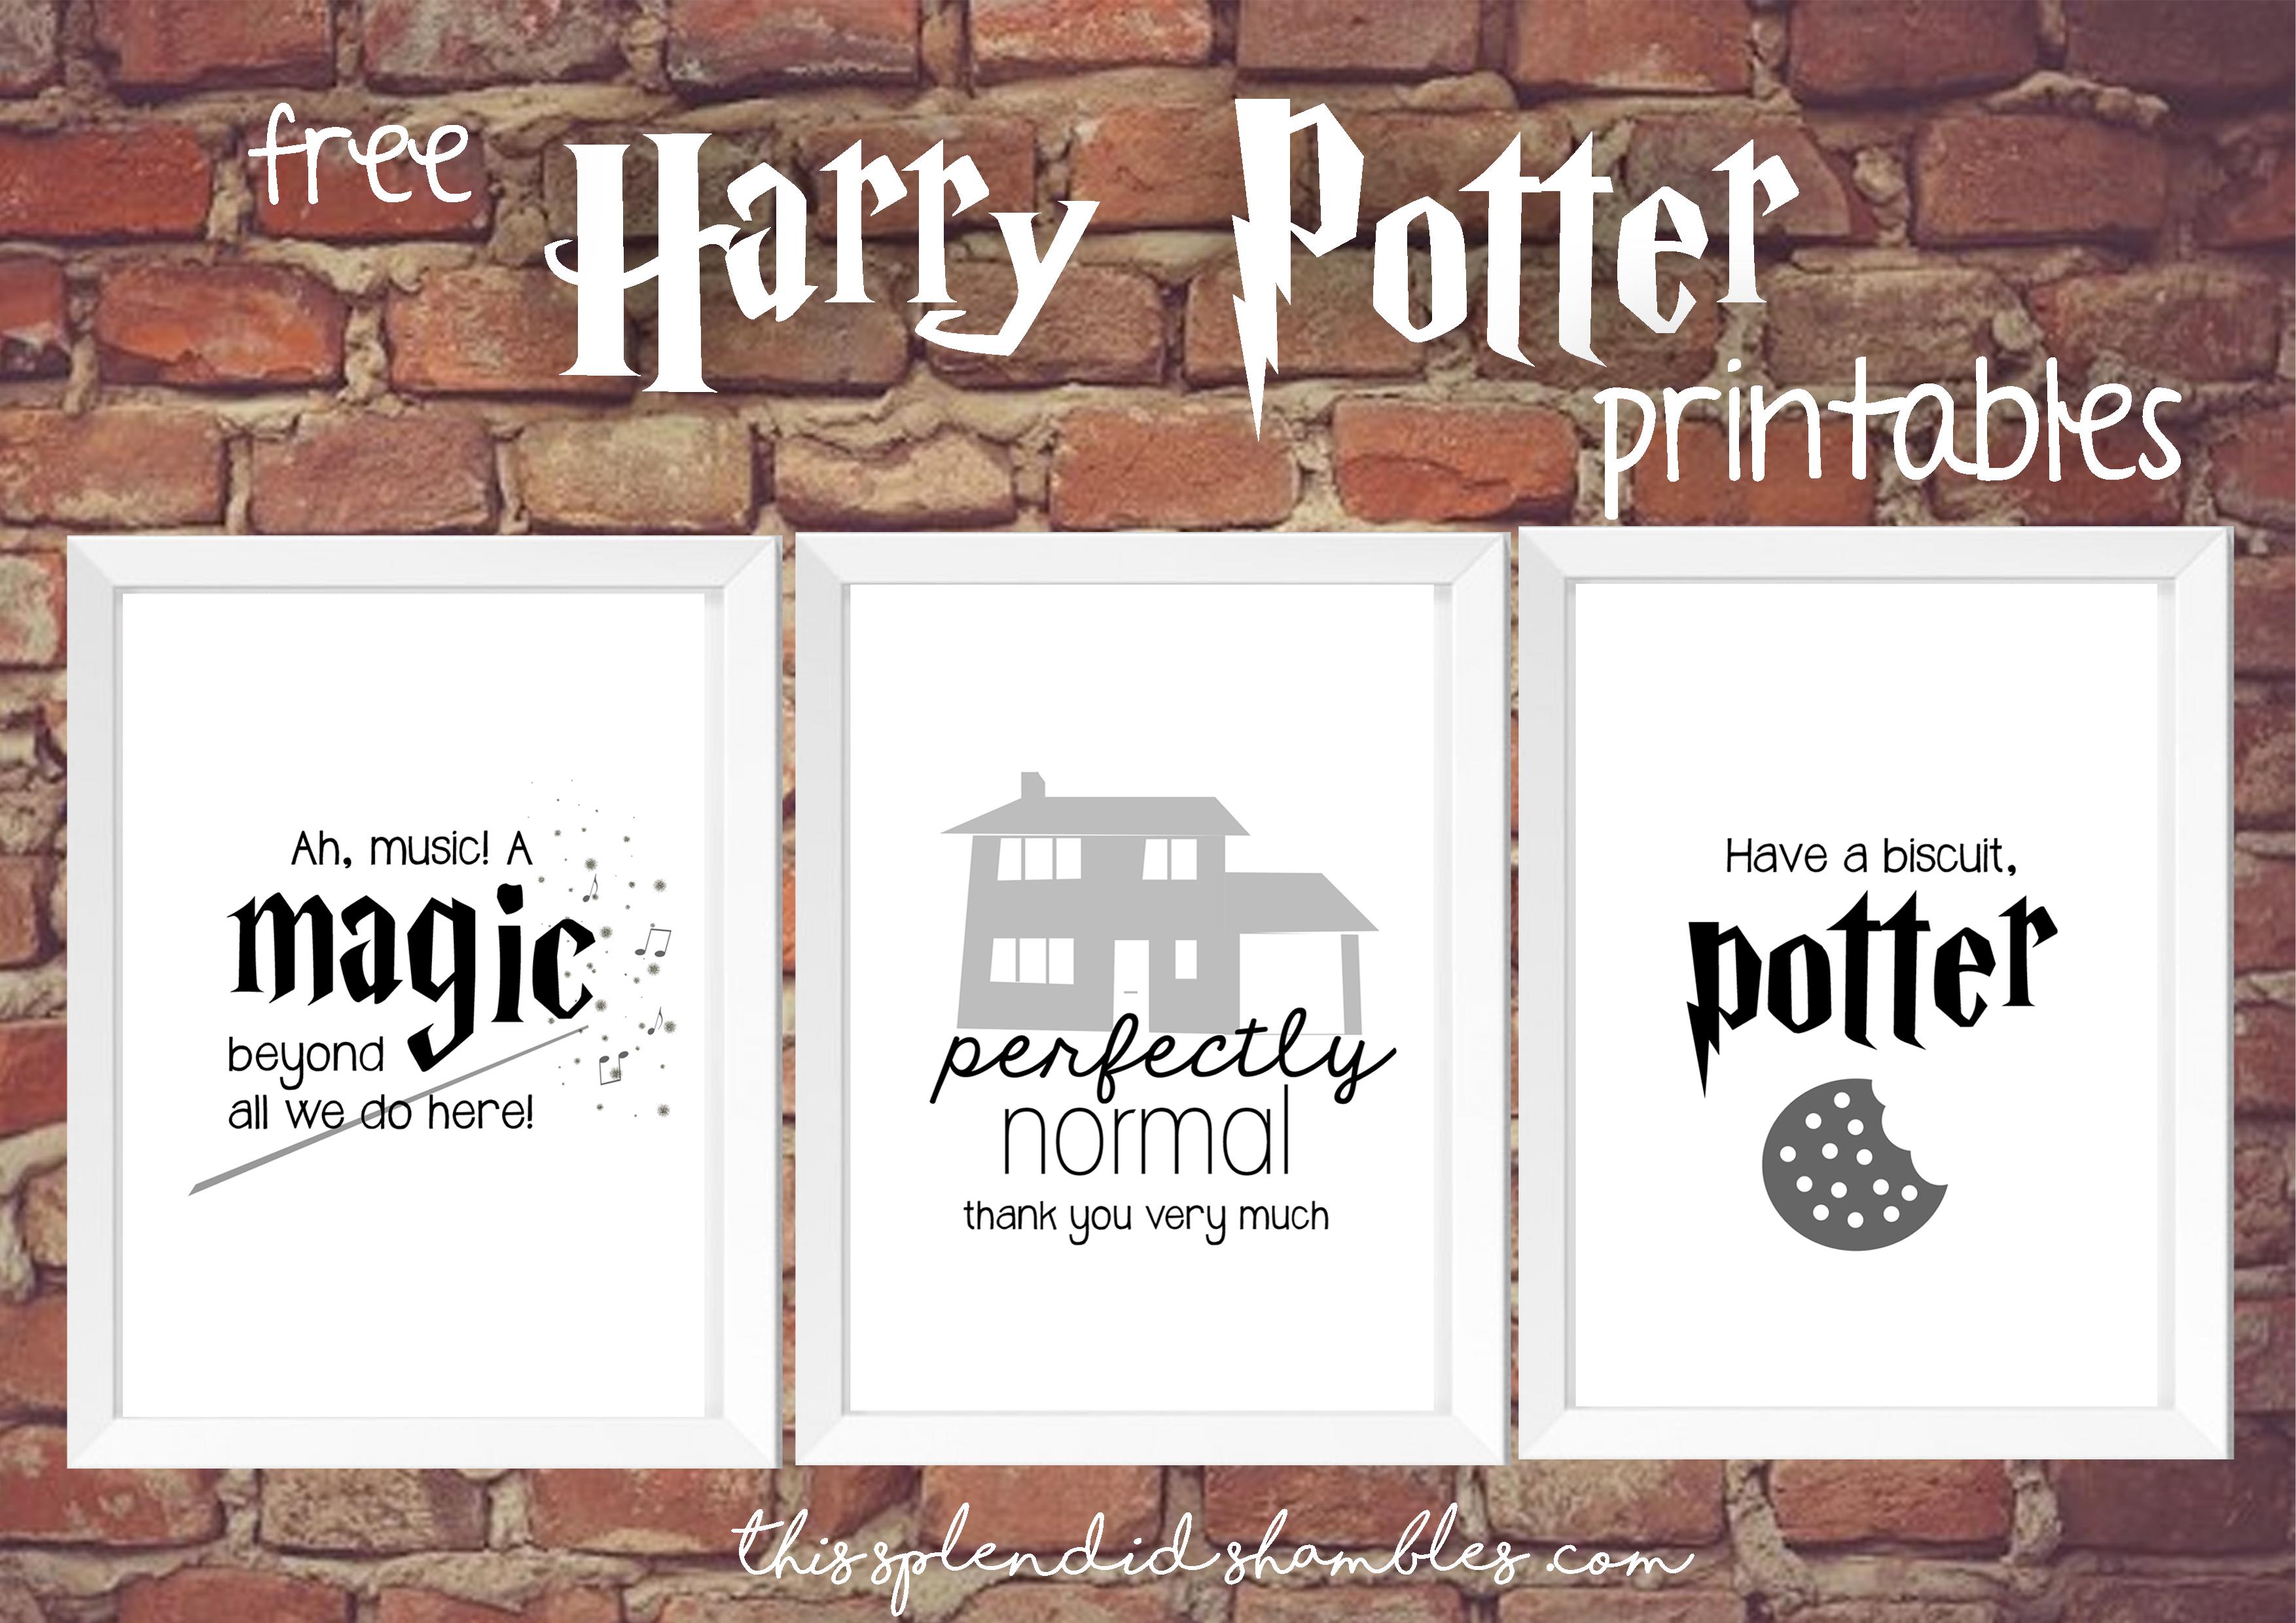 Harry Potter Week - 3 Free Printables - This Splendid Shambles - Free Harry Potter Printables